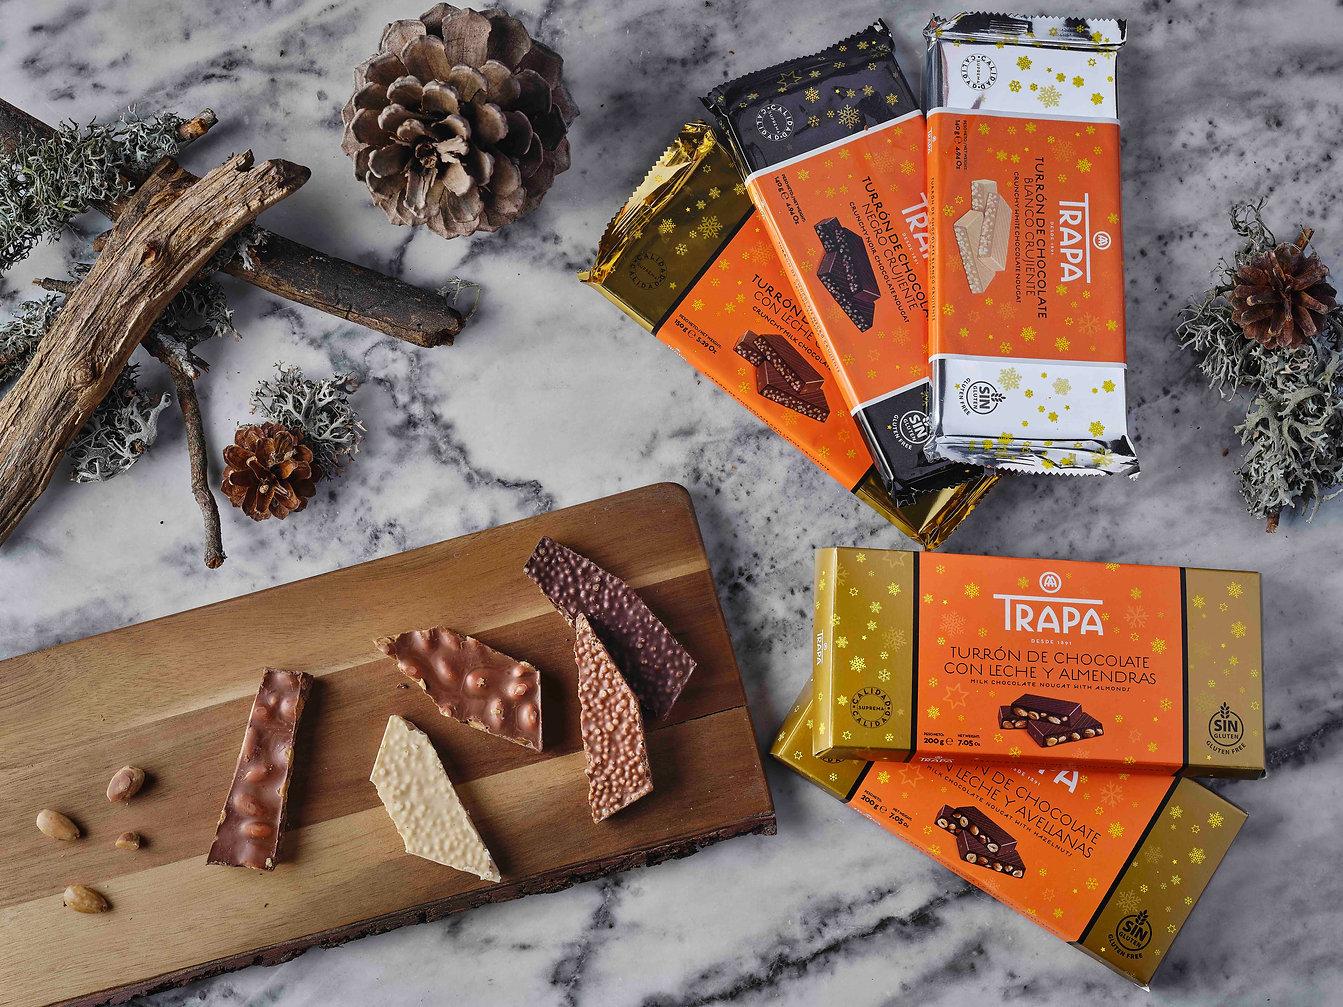 Turrón Trapa (Producto) - GastroMadrid